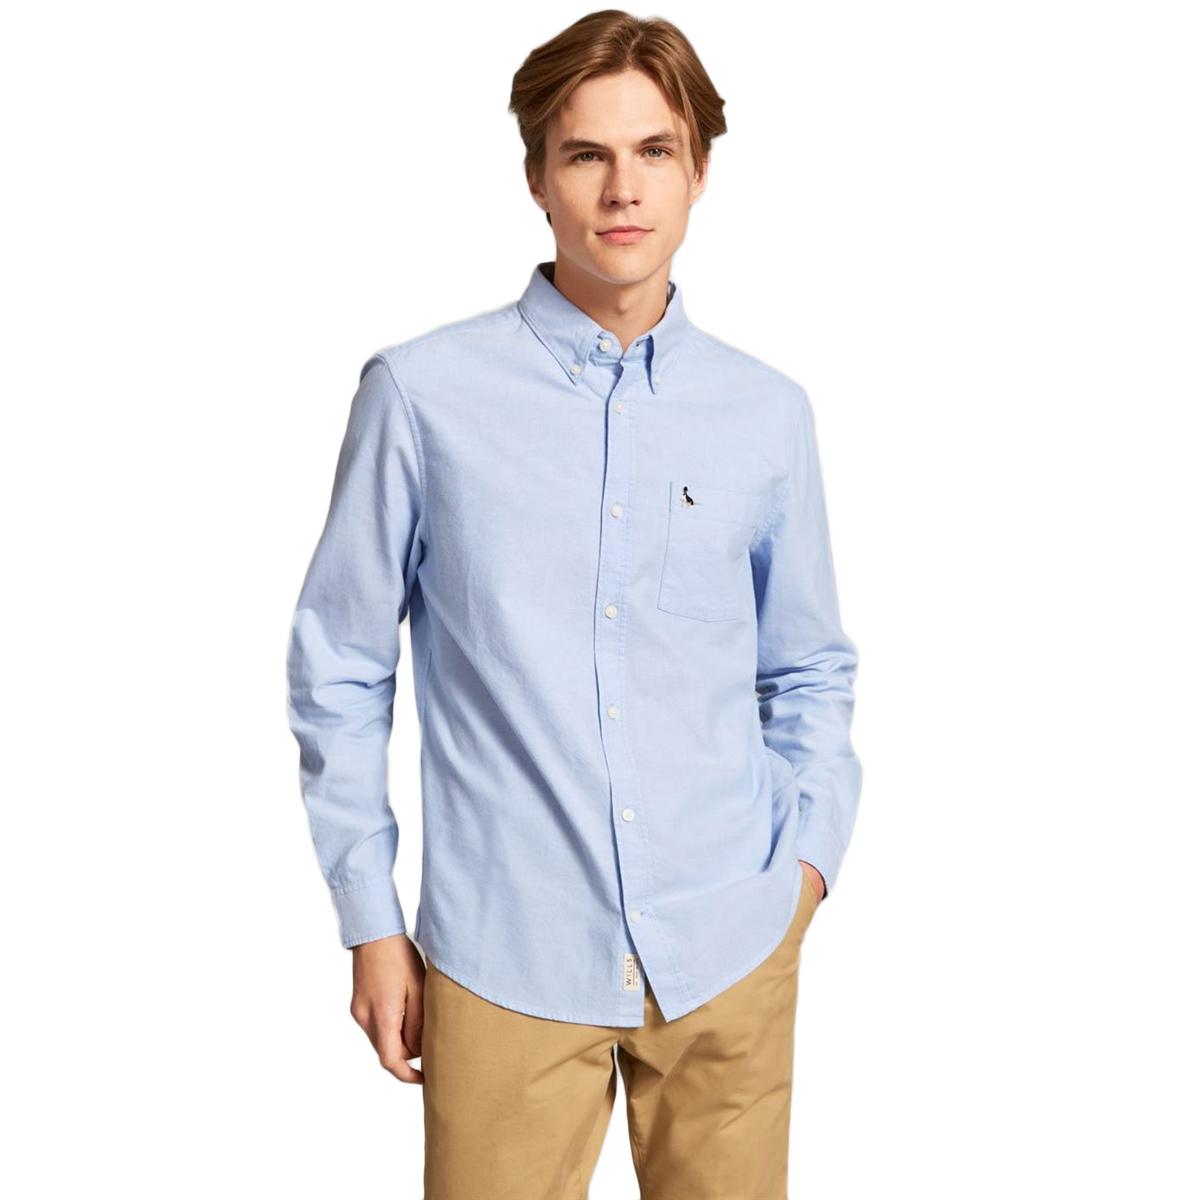 Jack Wills Men's Wadsworth Plain Oxford Shirt - Blue, L